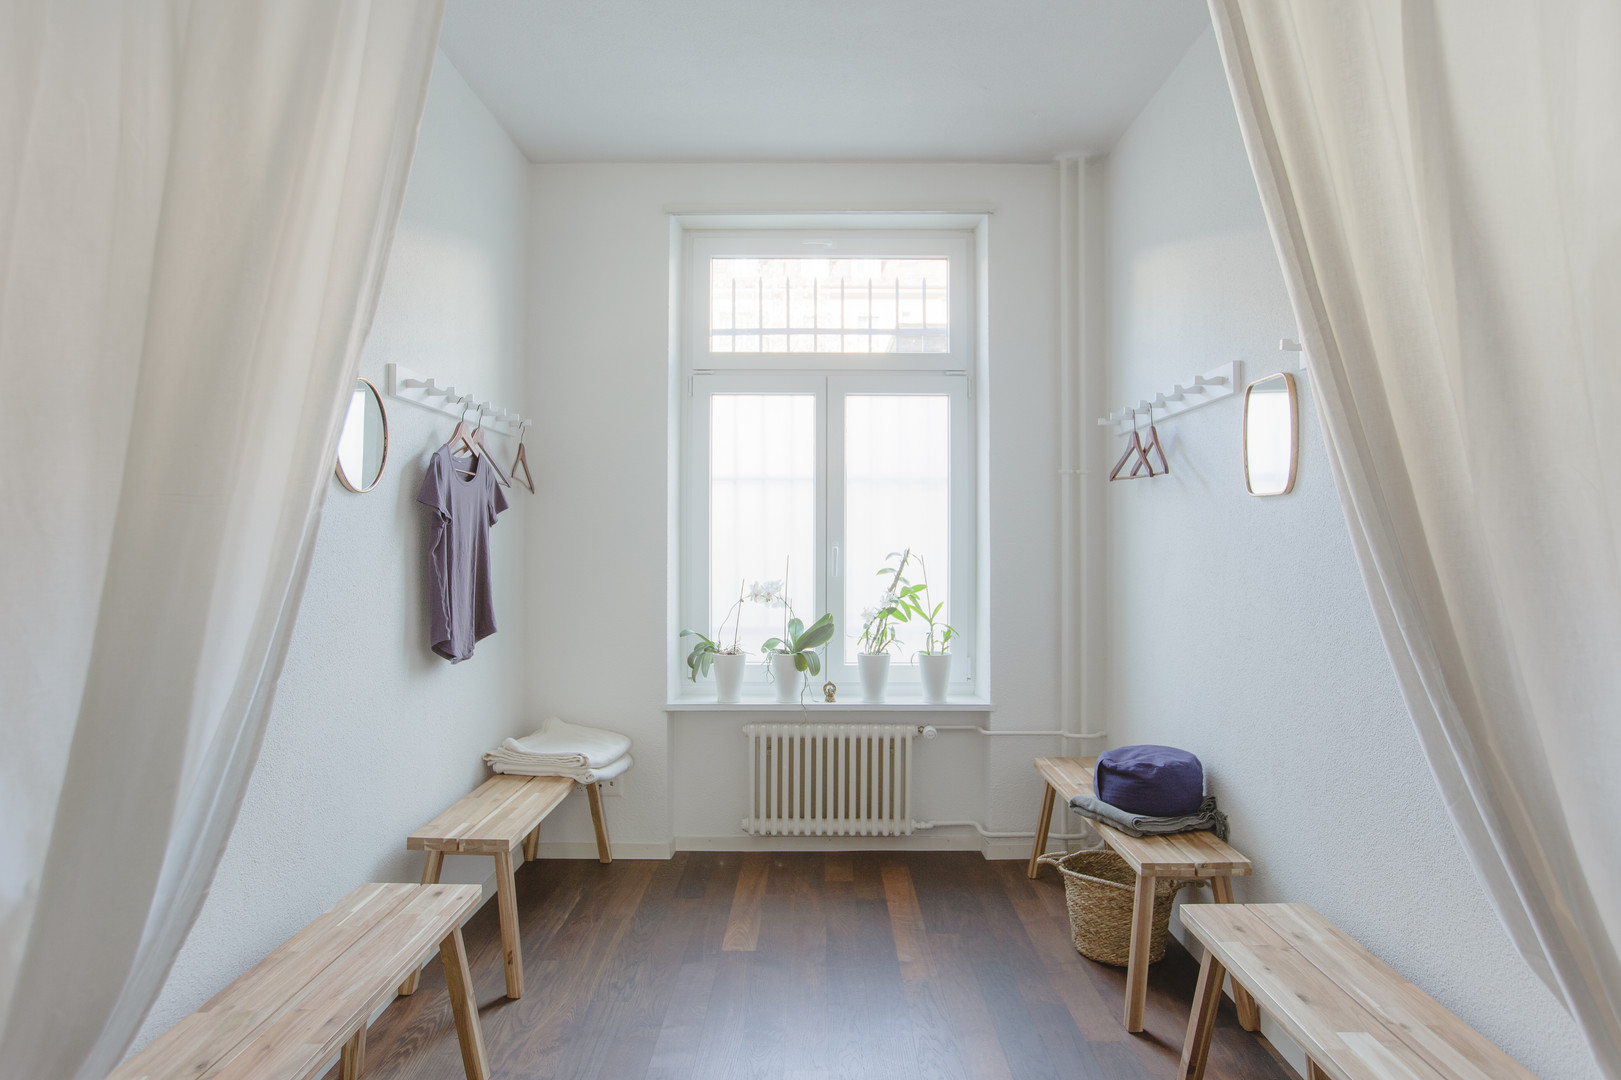 Yogastudio Zuerich Garderobe-2.jpg